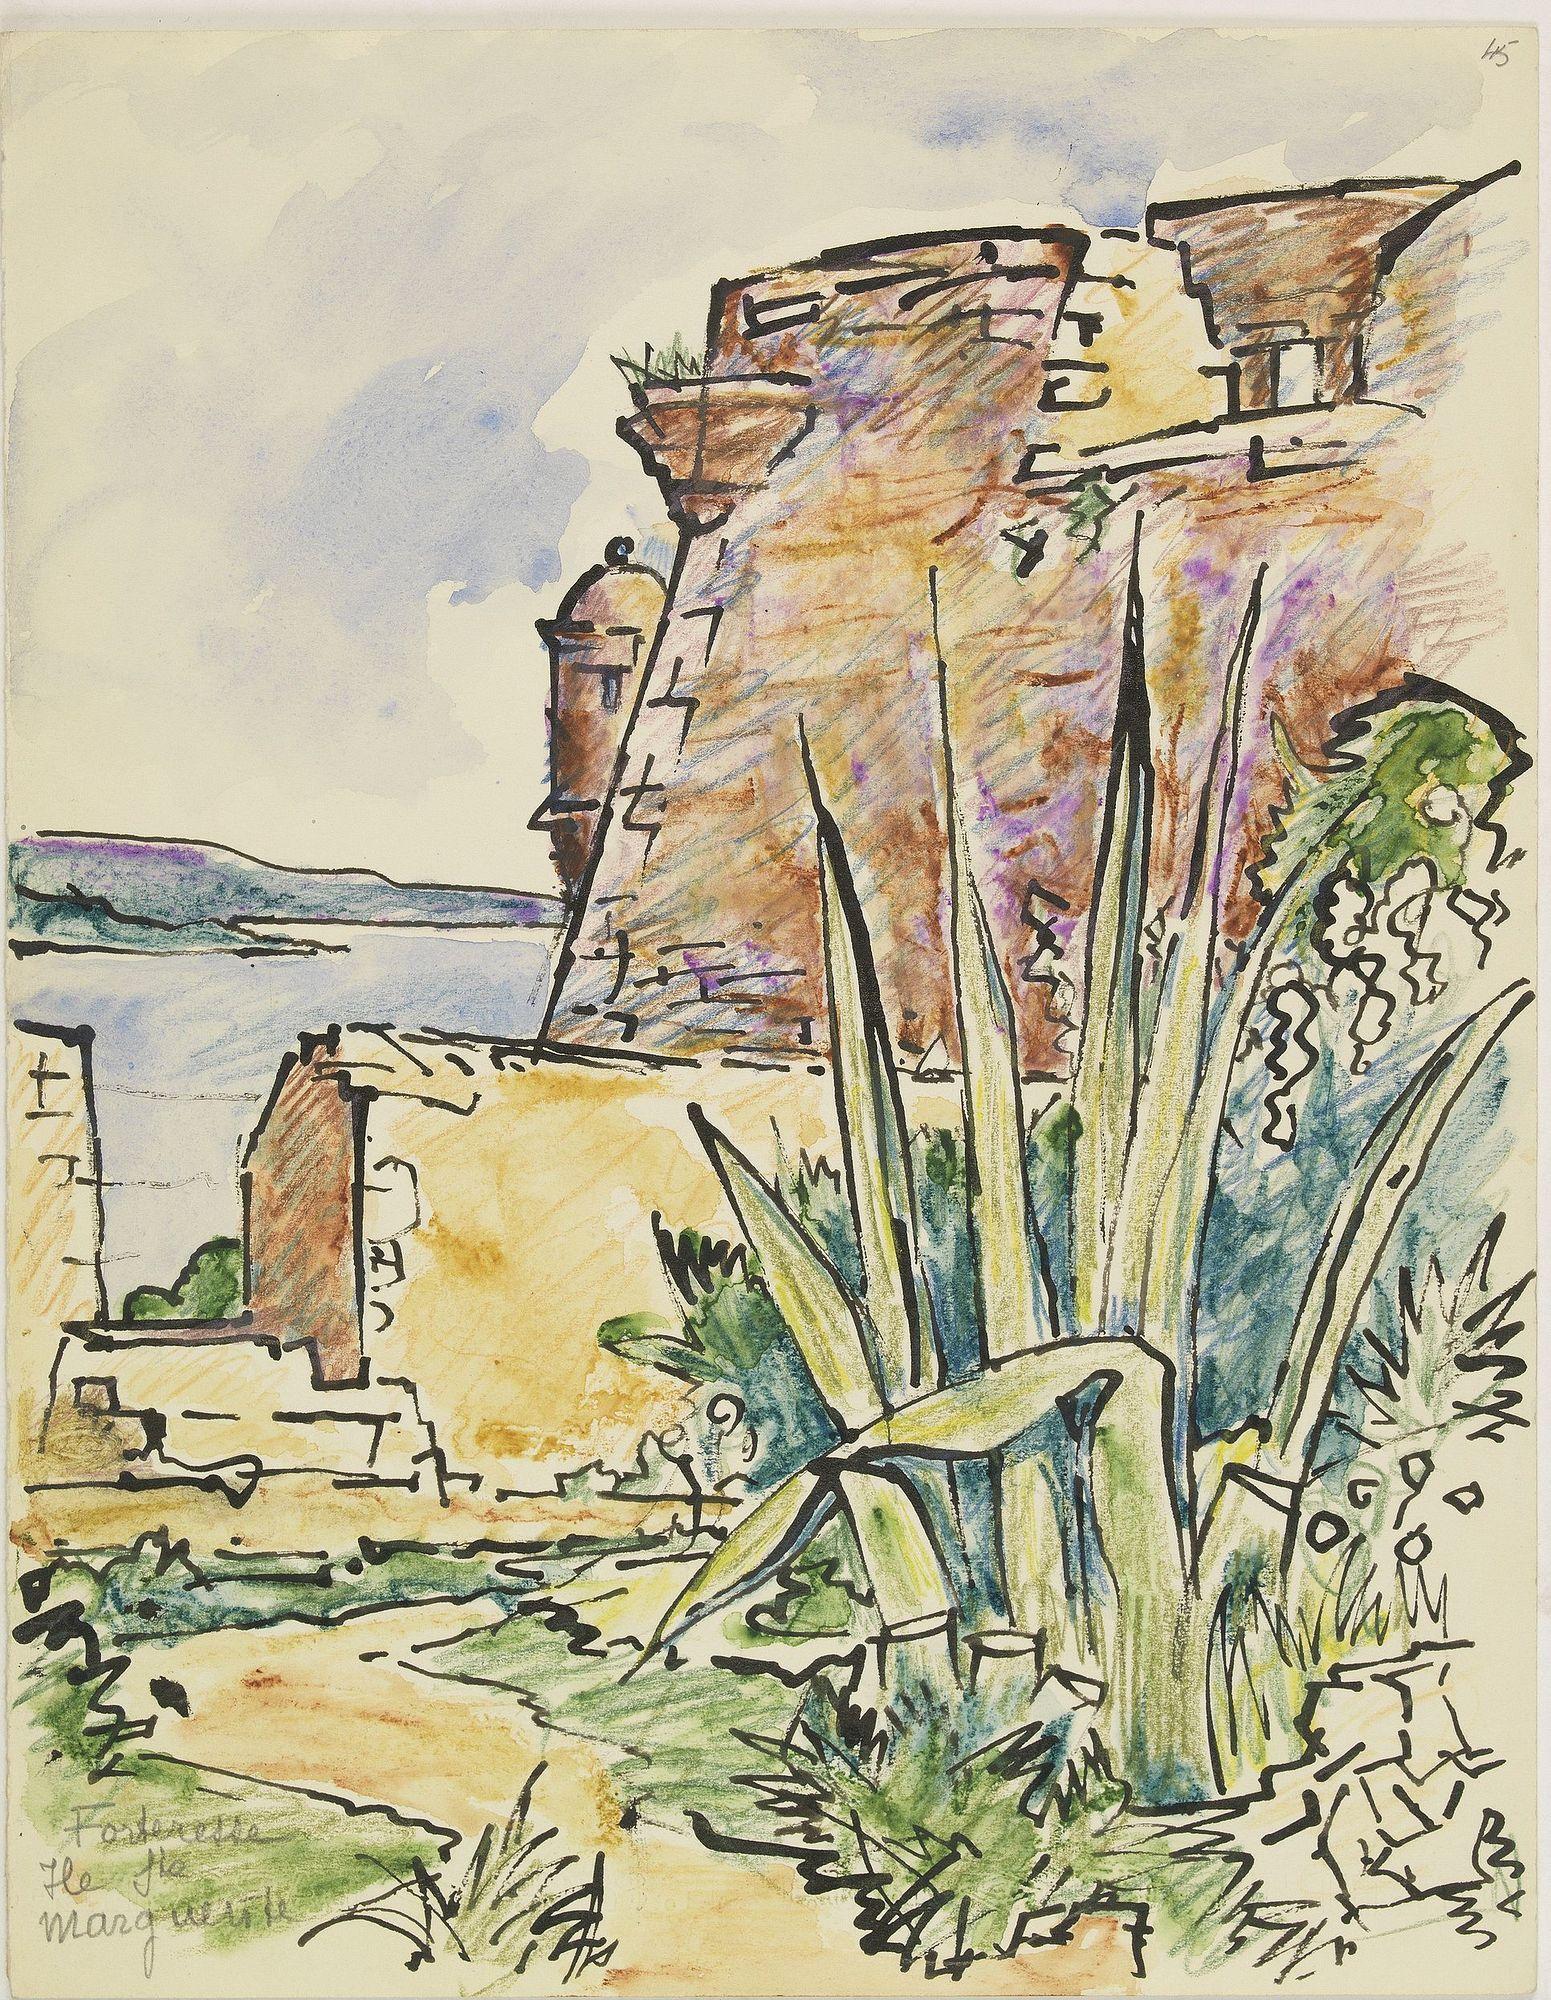 PAUTY, E. -  Forteresse Ile Ste Marguerite.